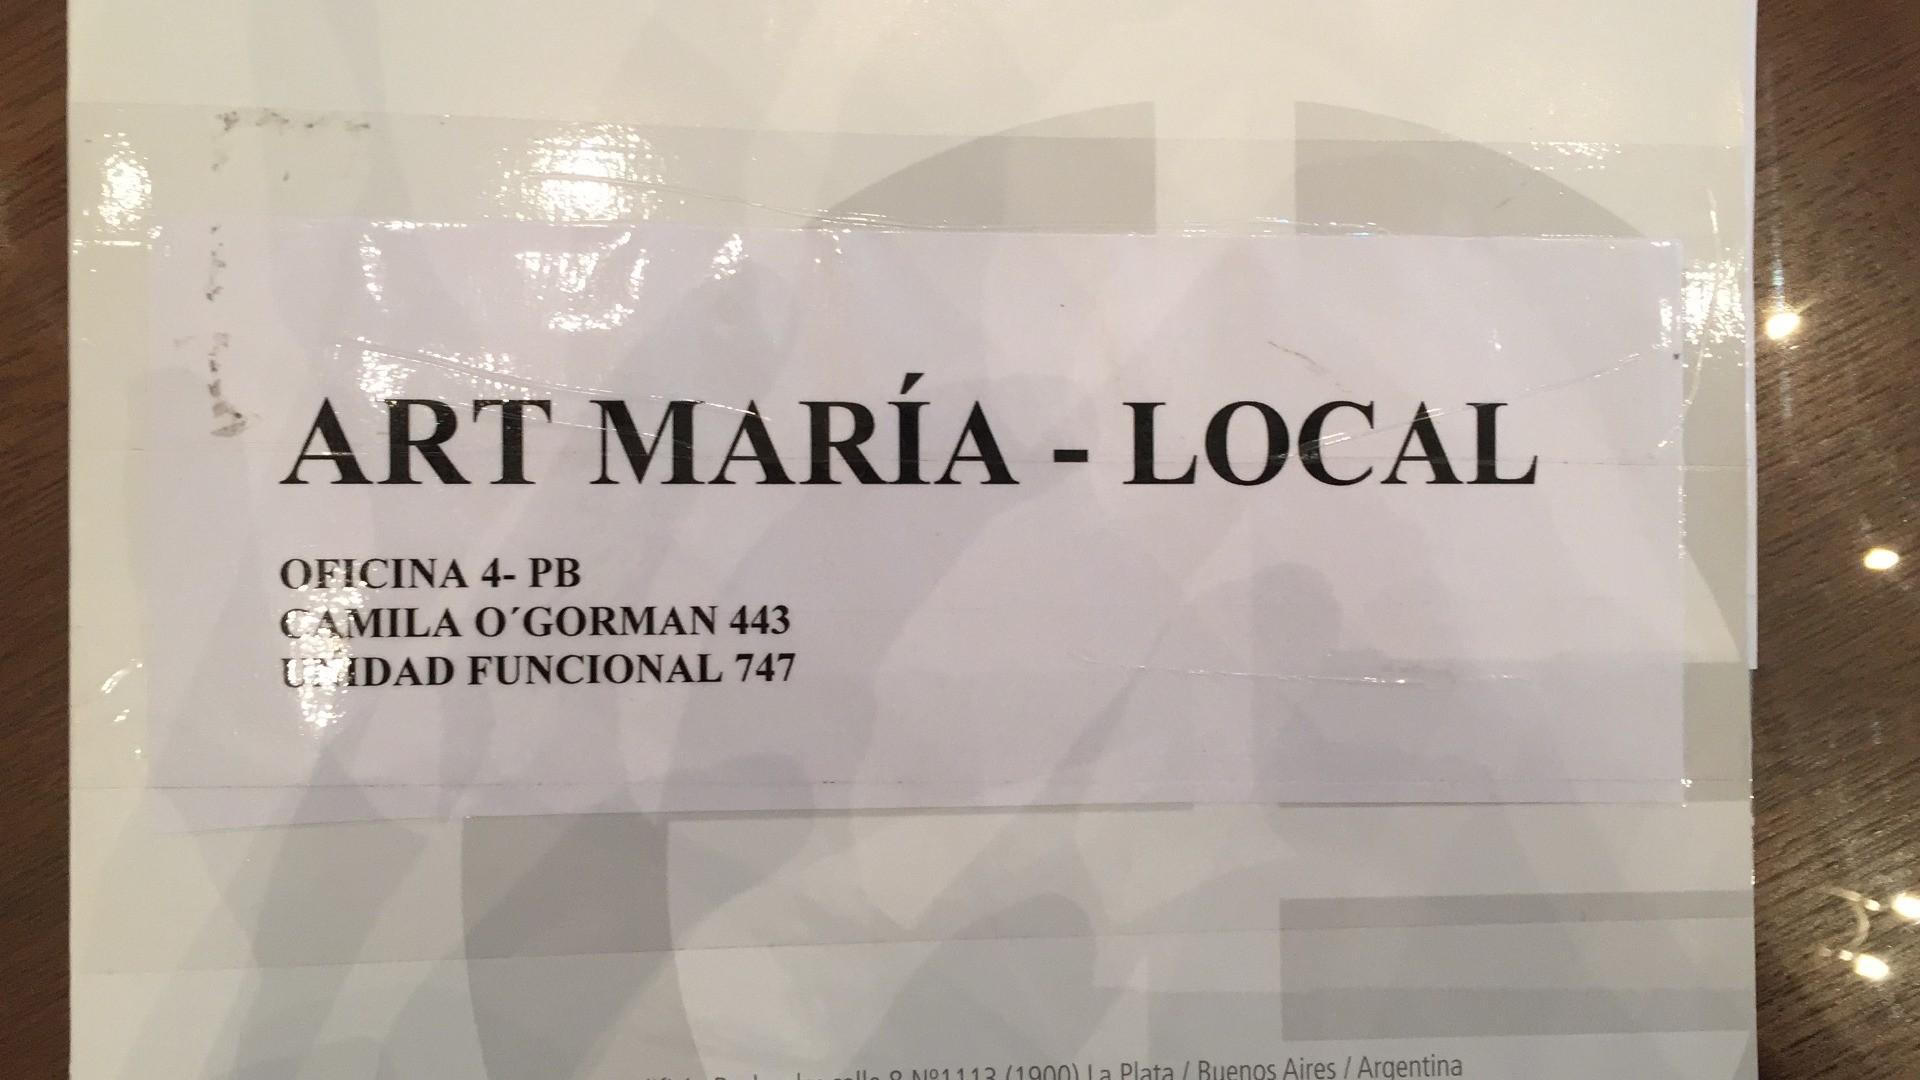 Camila O' Gorman nº 443